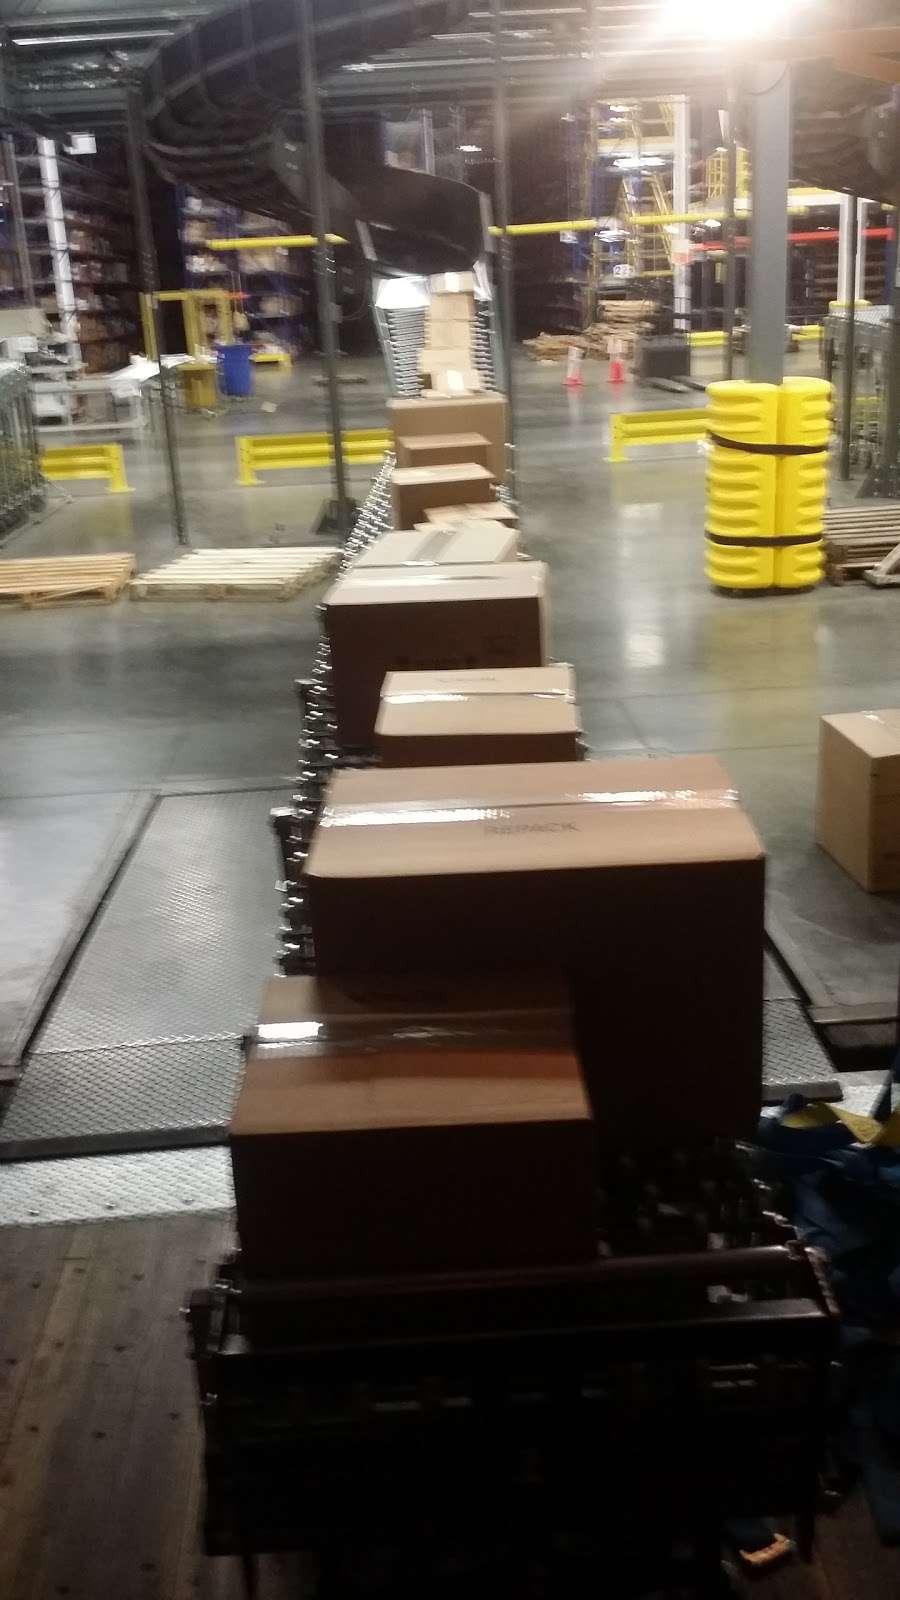 McKesson Medical-Surgical Inc. - storage  | Photo 2 of 4 | Address: 885 Paragon Way, Rock Hill, SC 29730, USA | Phone: (803) 832-0175